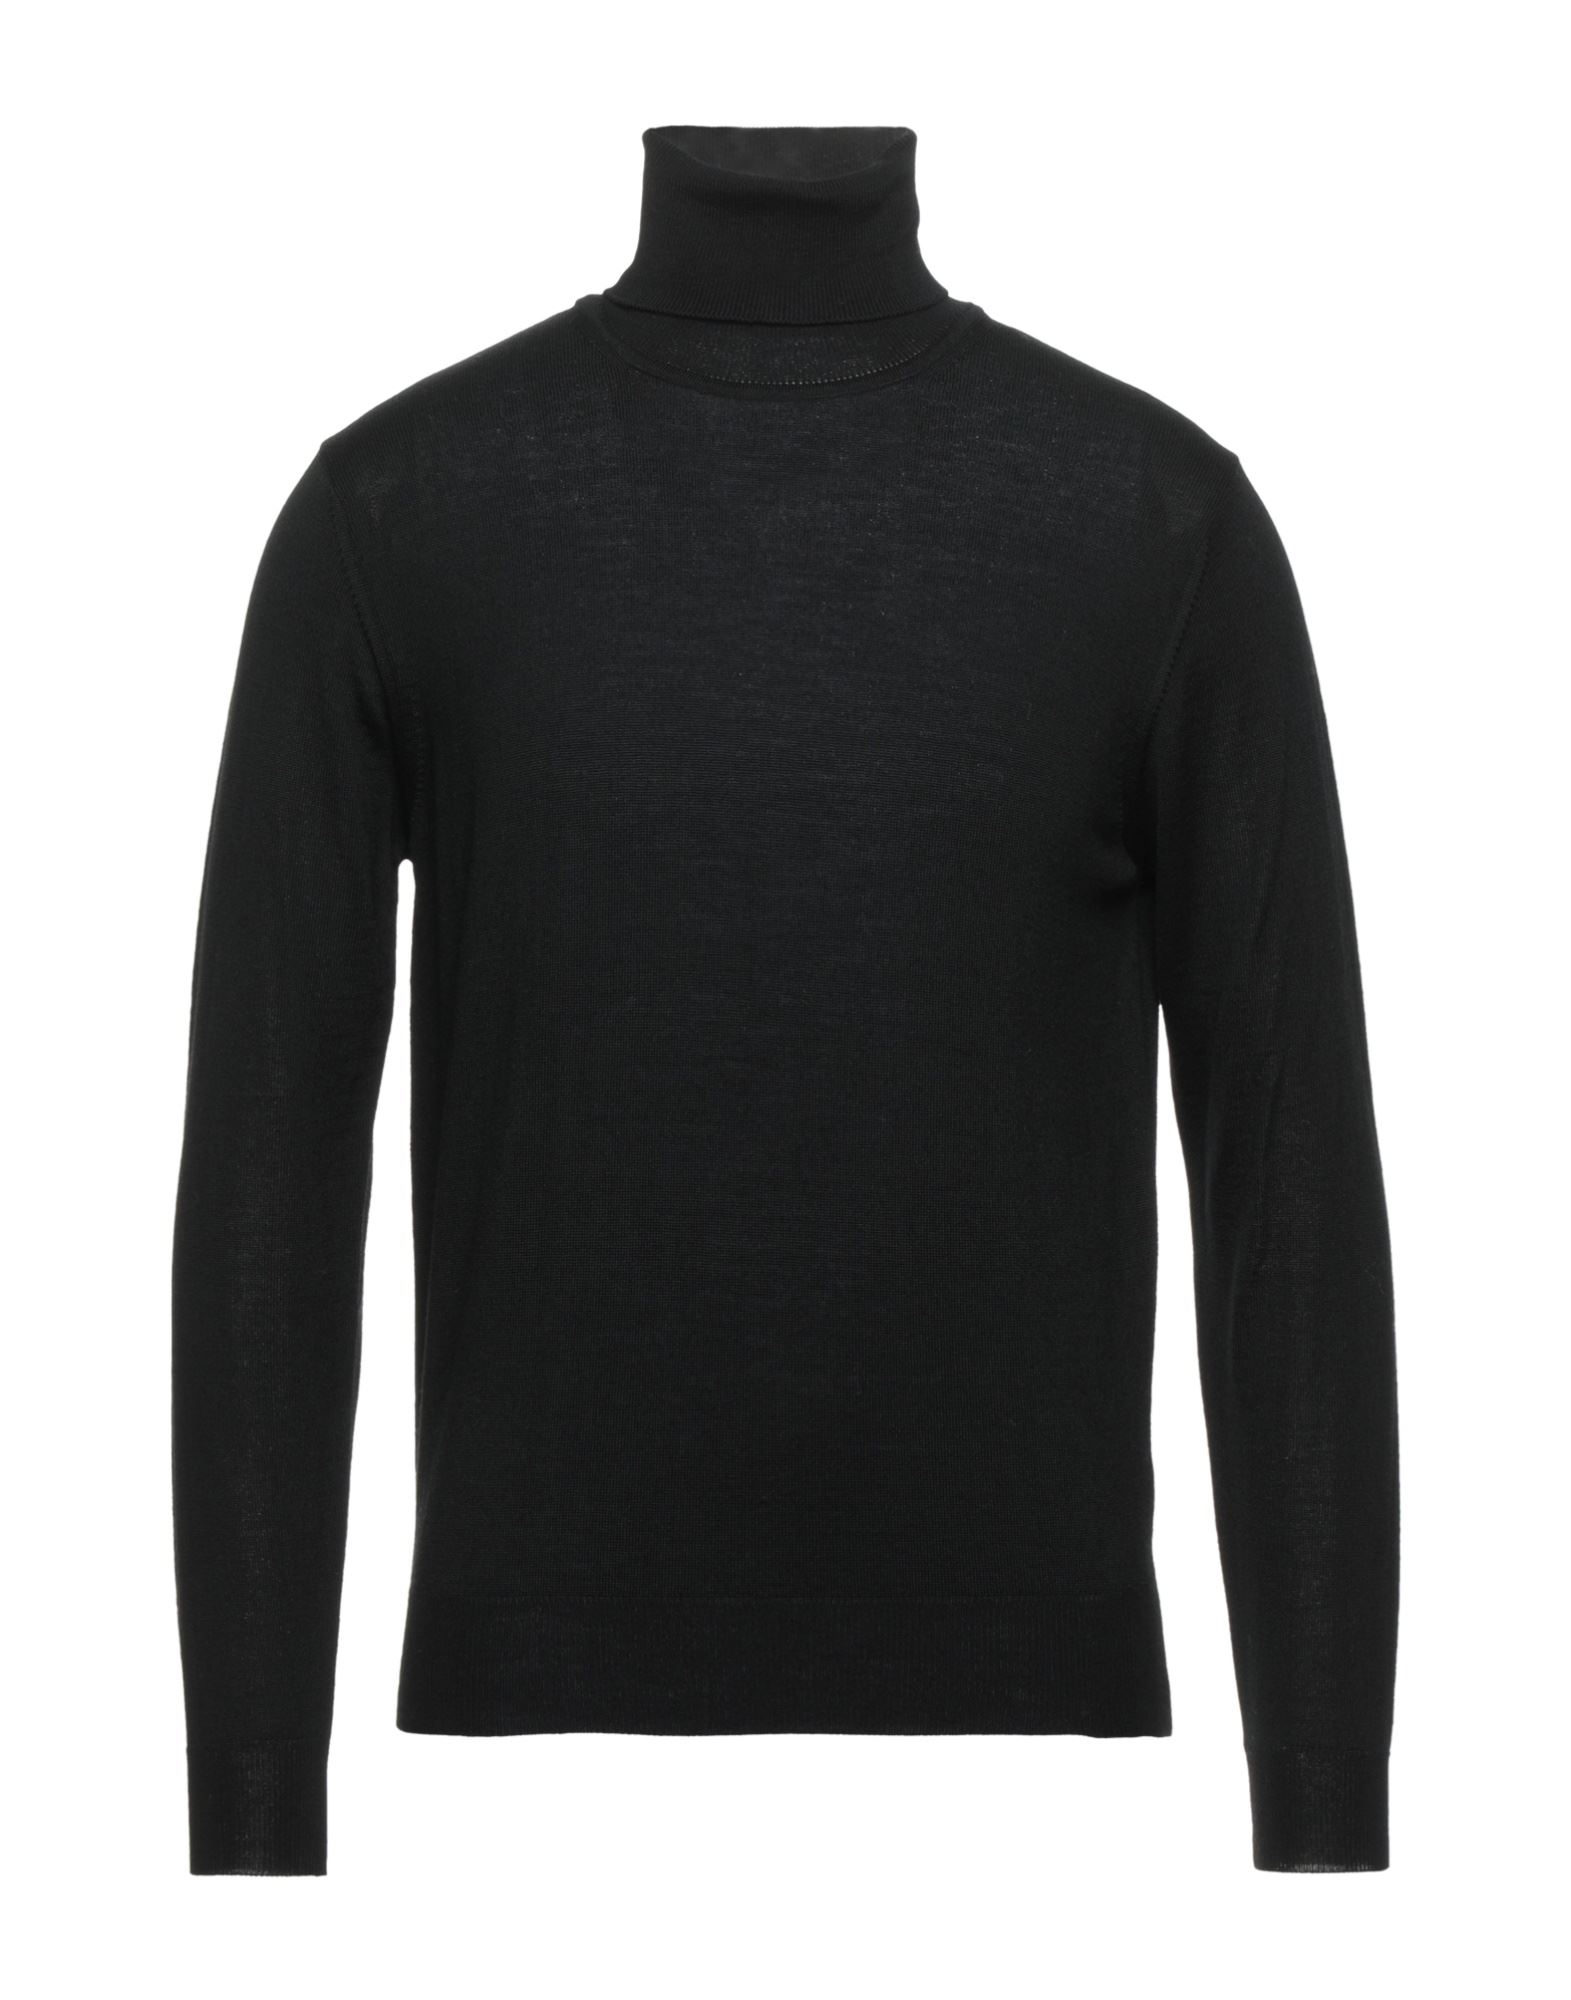 Acquapura Turtlenecks In Black